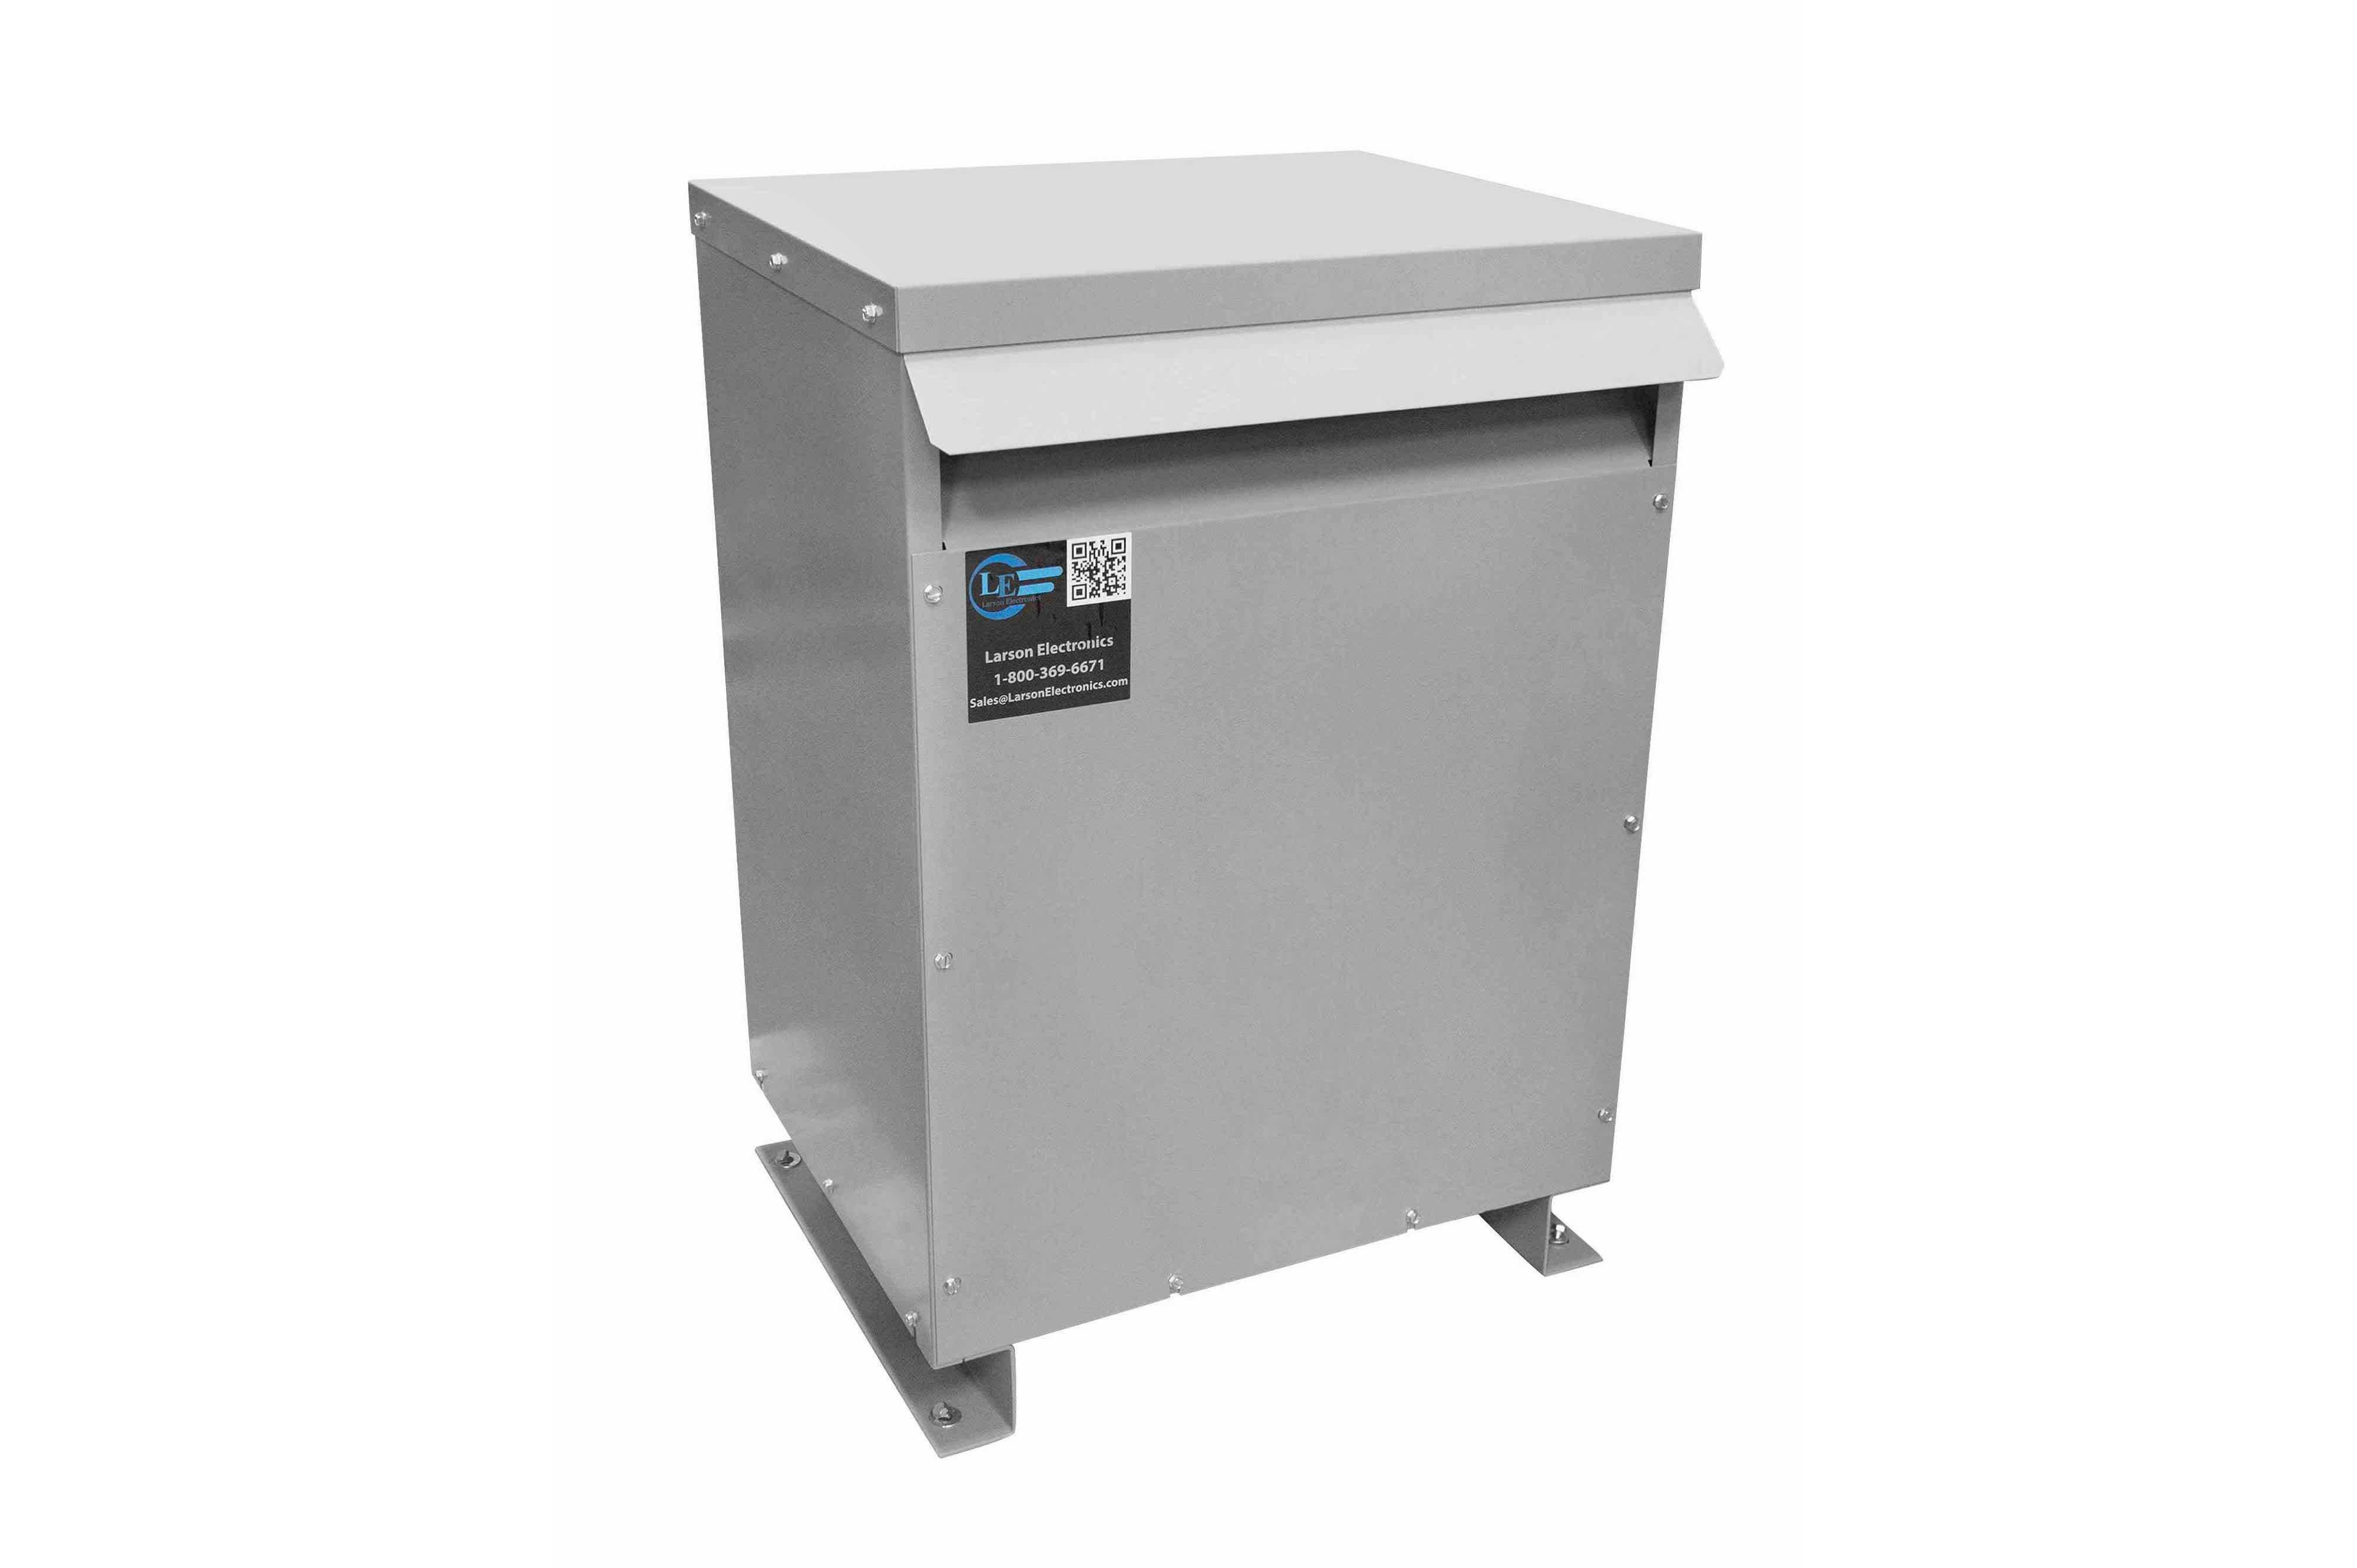 80 kVA 3PH Isolation Transformer, 600V Wye Primary, 208Y/120 Wye-N Secondary, N3R, Ventilated, 60 Hz